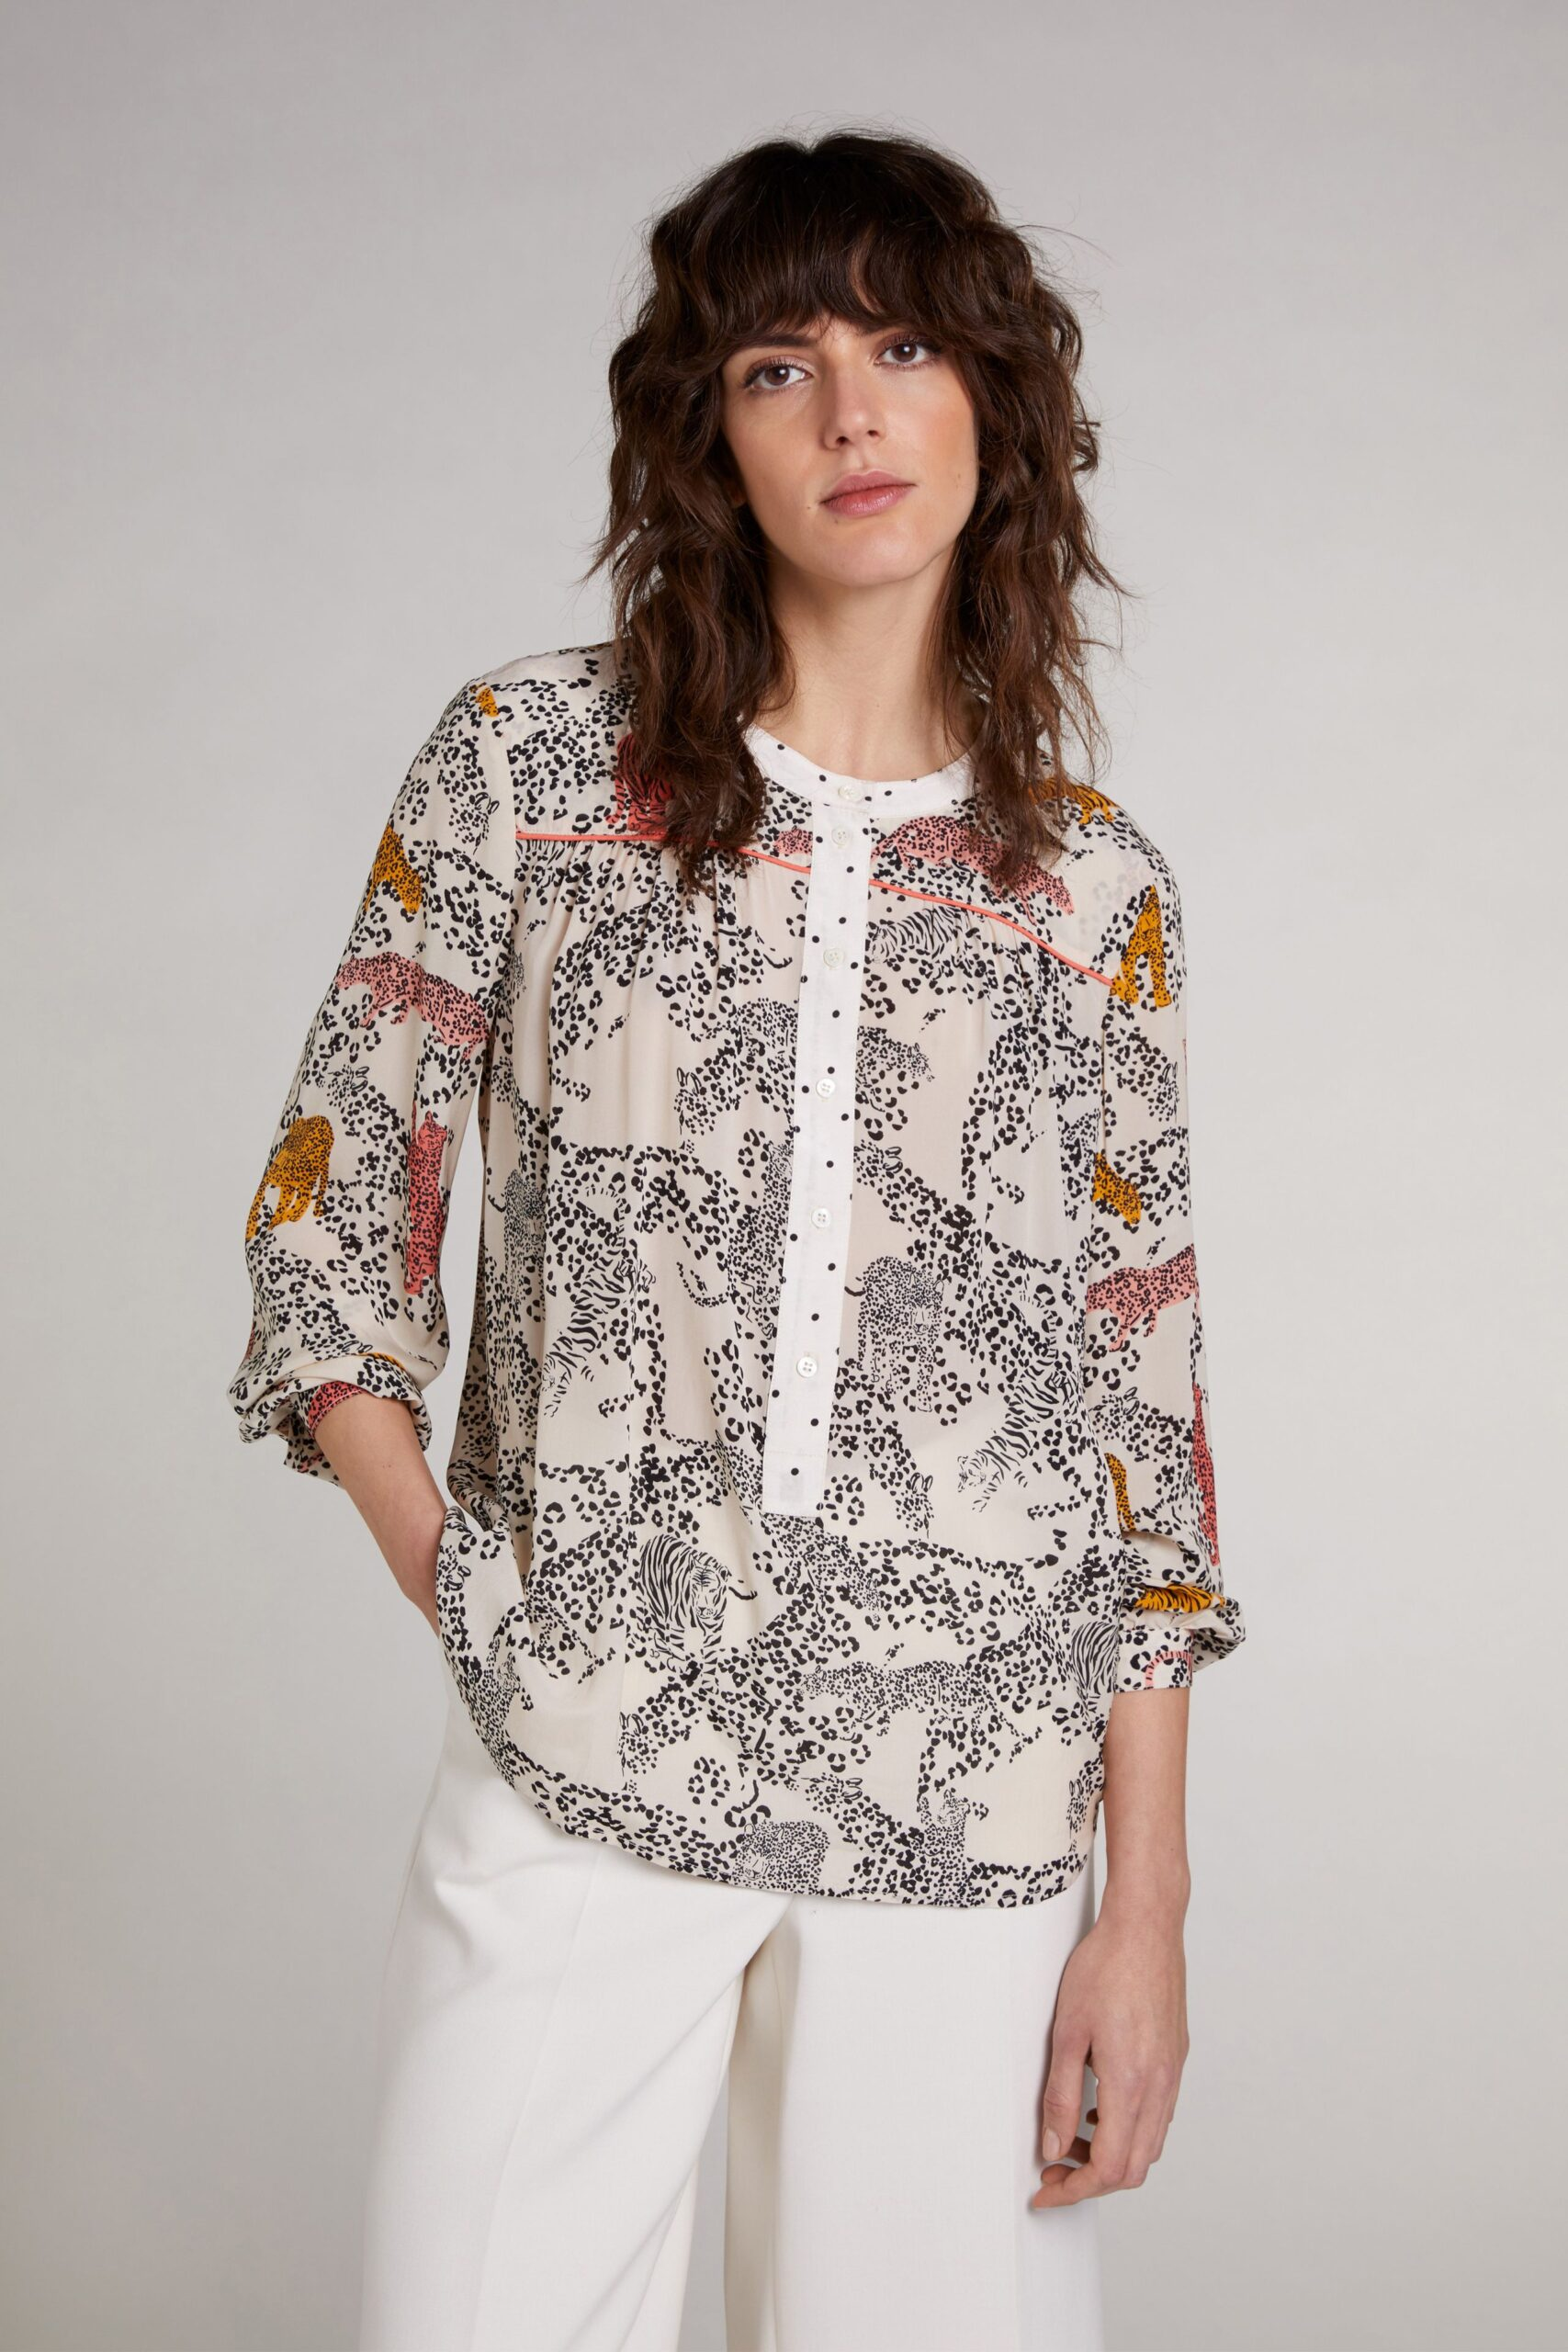 oui animal print blouse effigy boutique